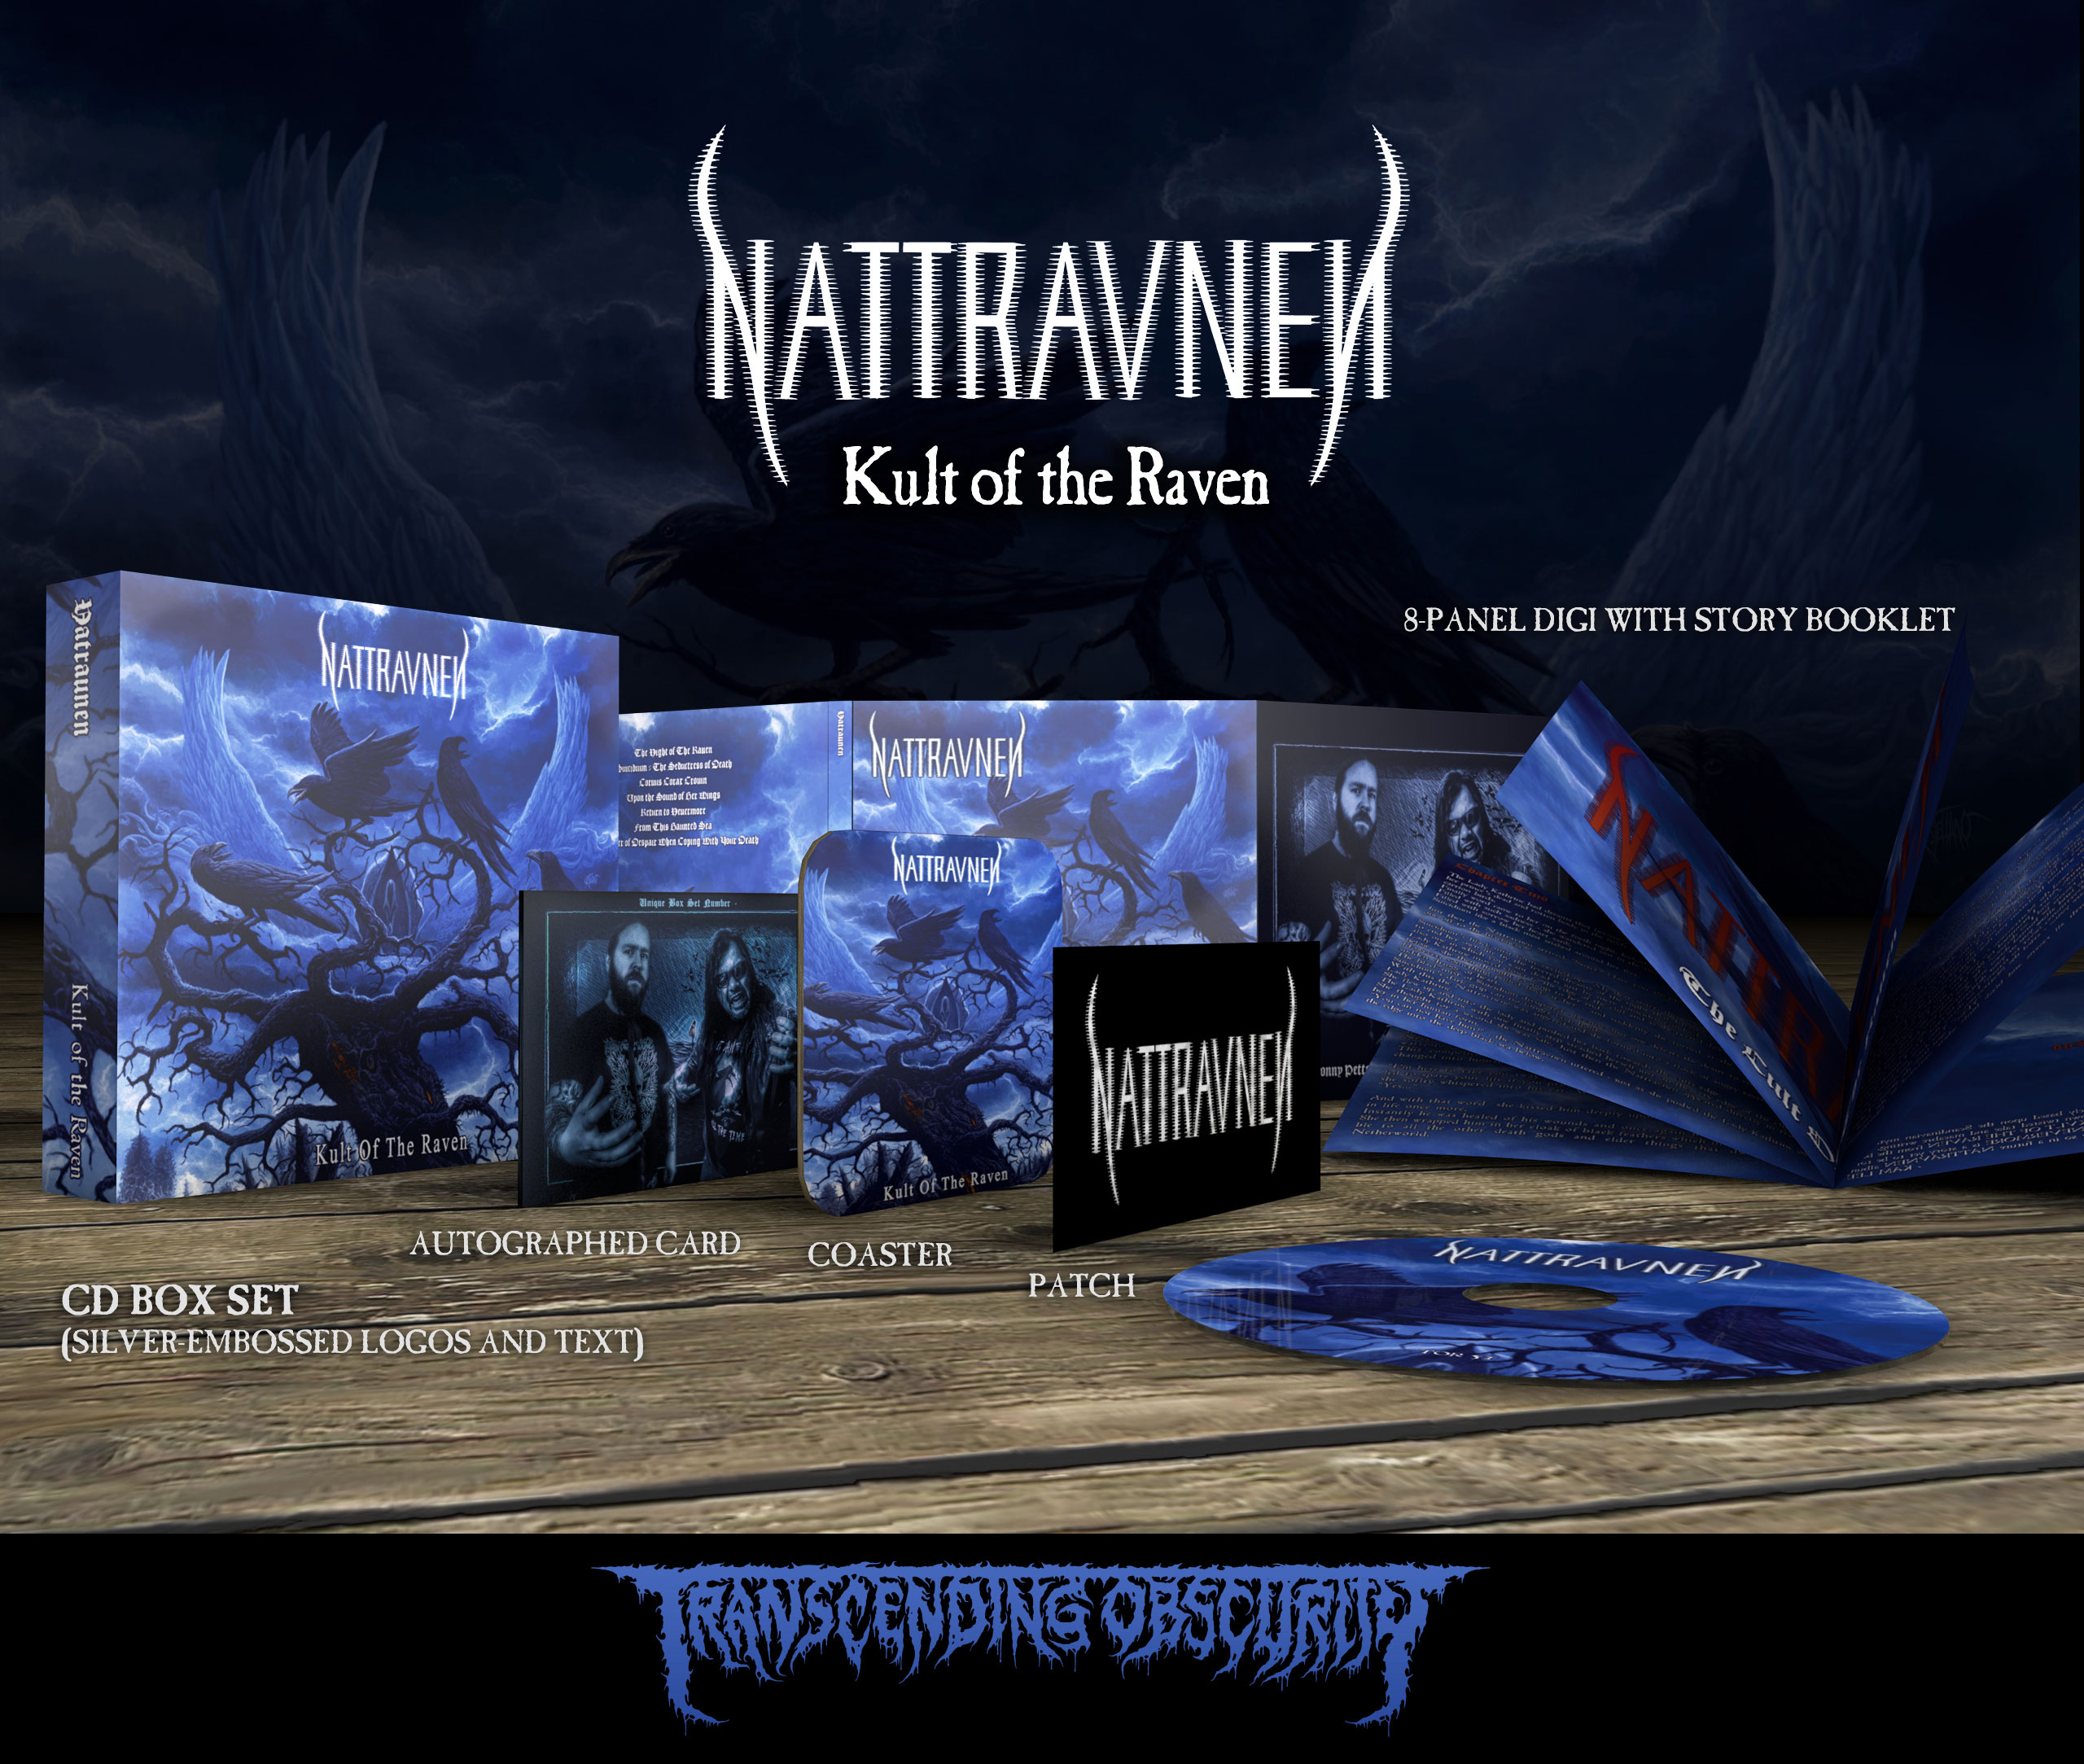 NATTRAVNEN (US/UK) - 'Kult of the Raven' Autographed CD Box Set (Limited to 150)